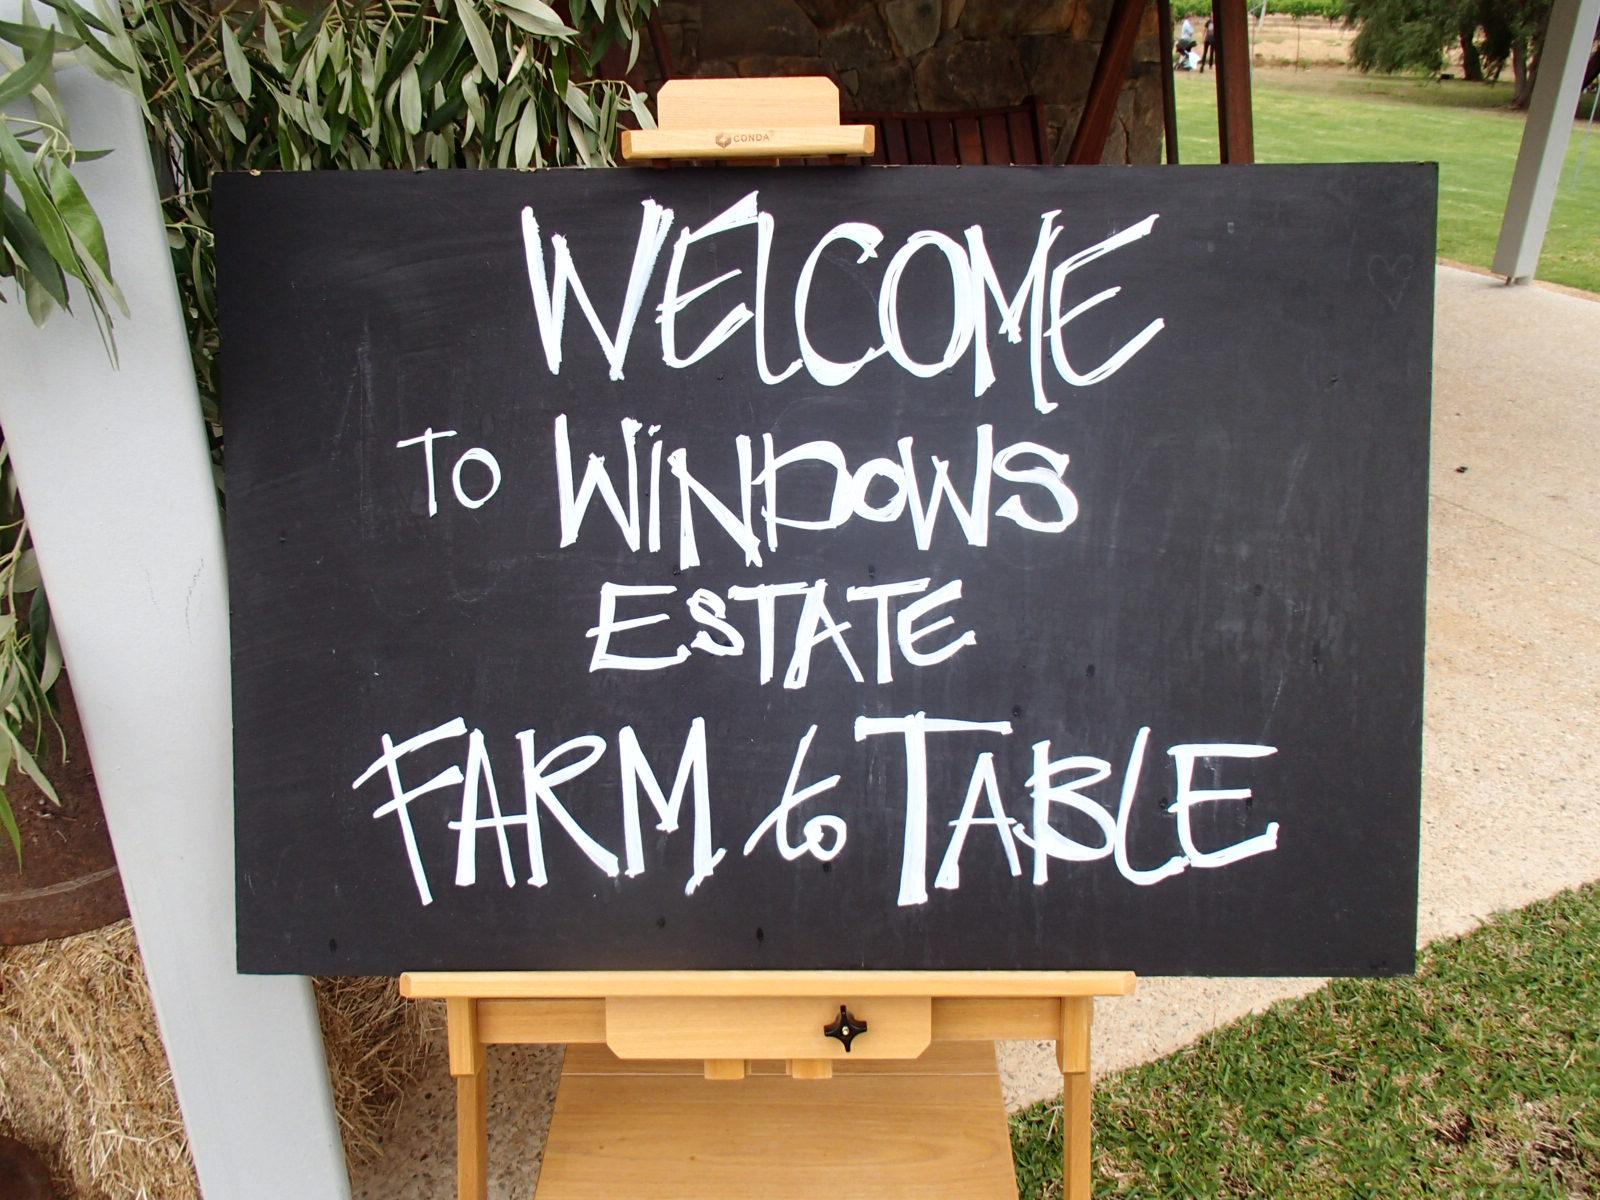 Windows estate Winery